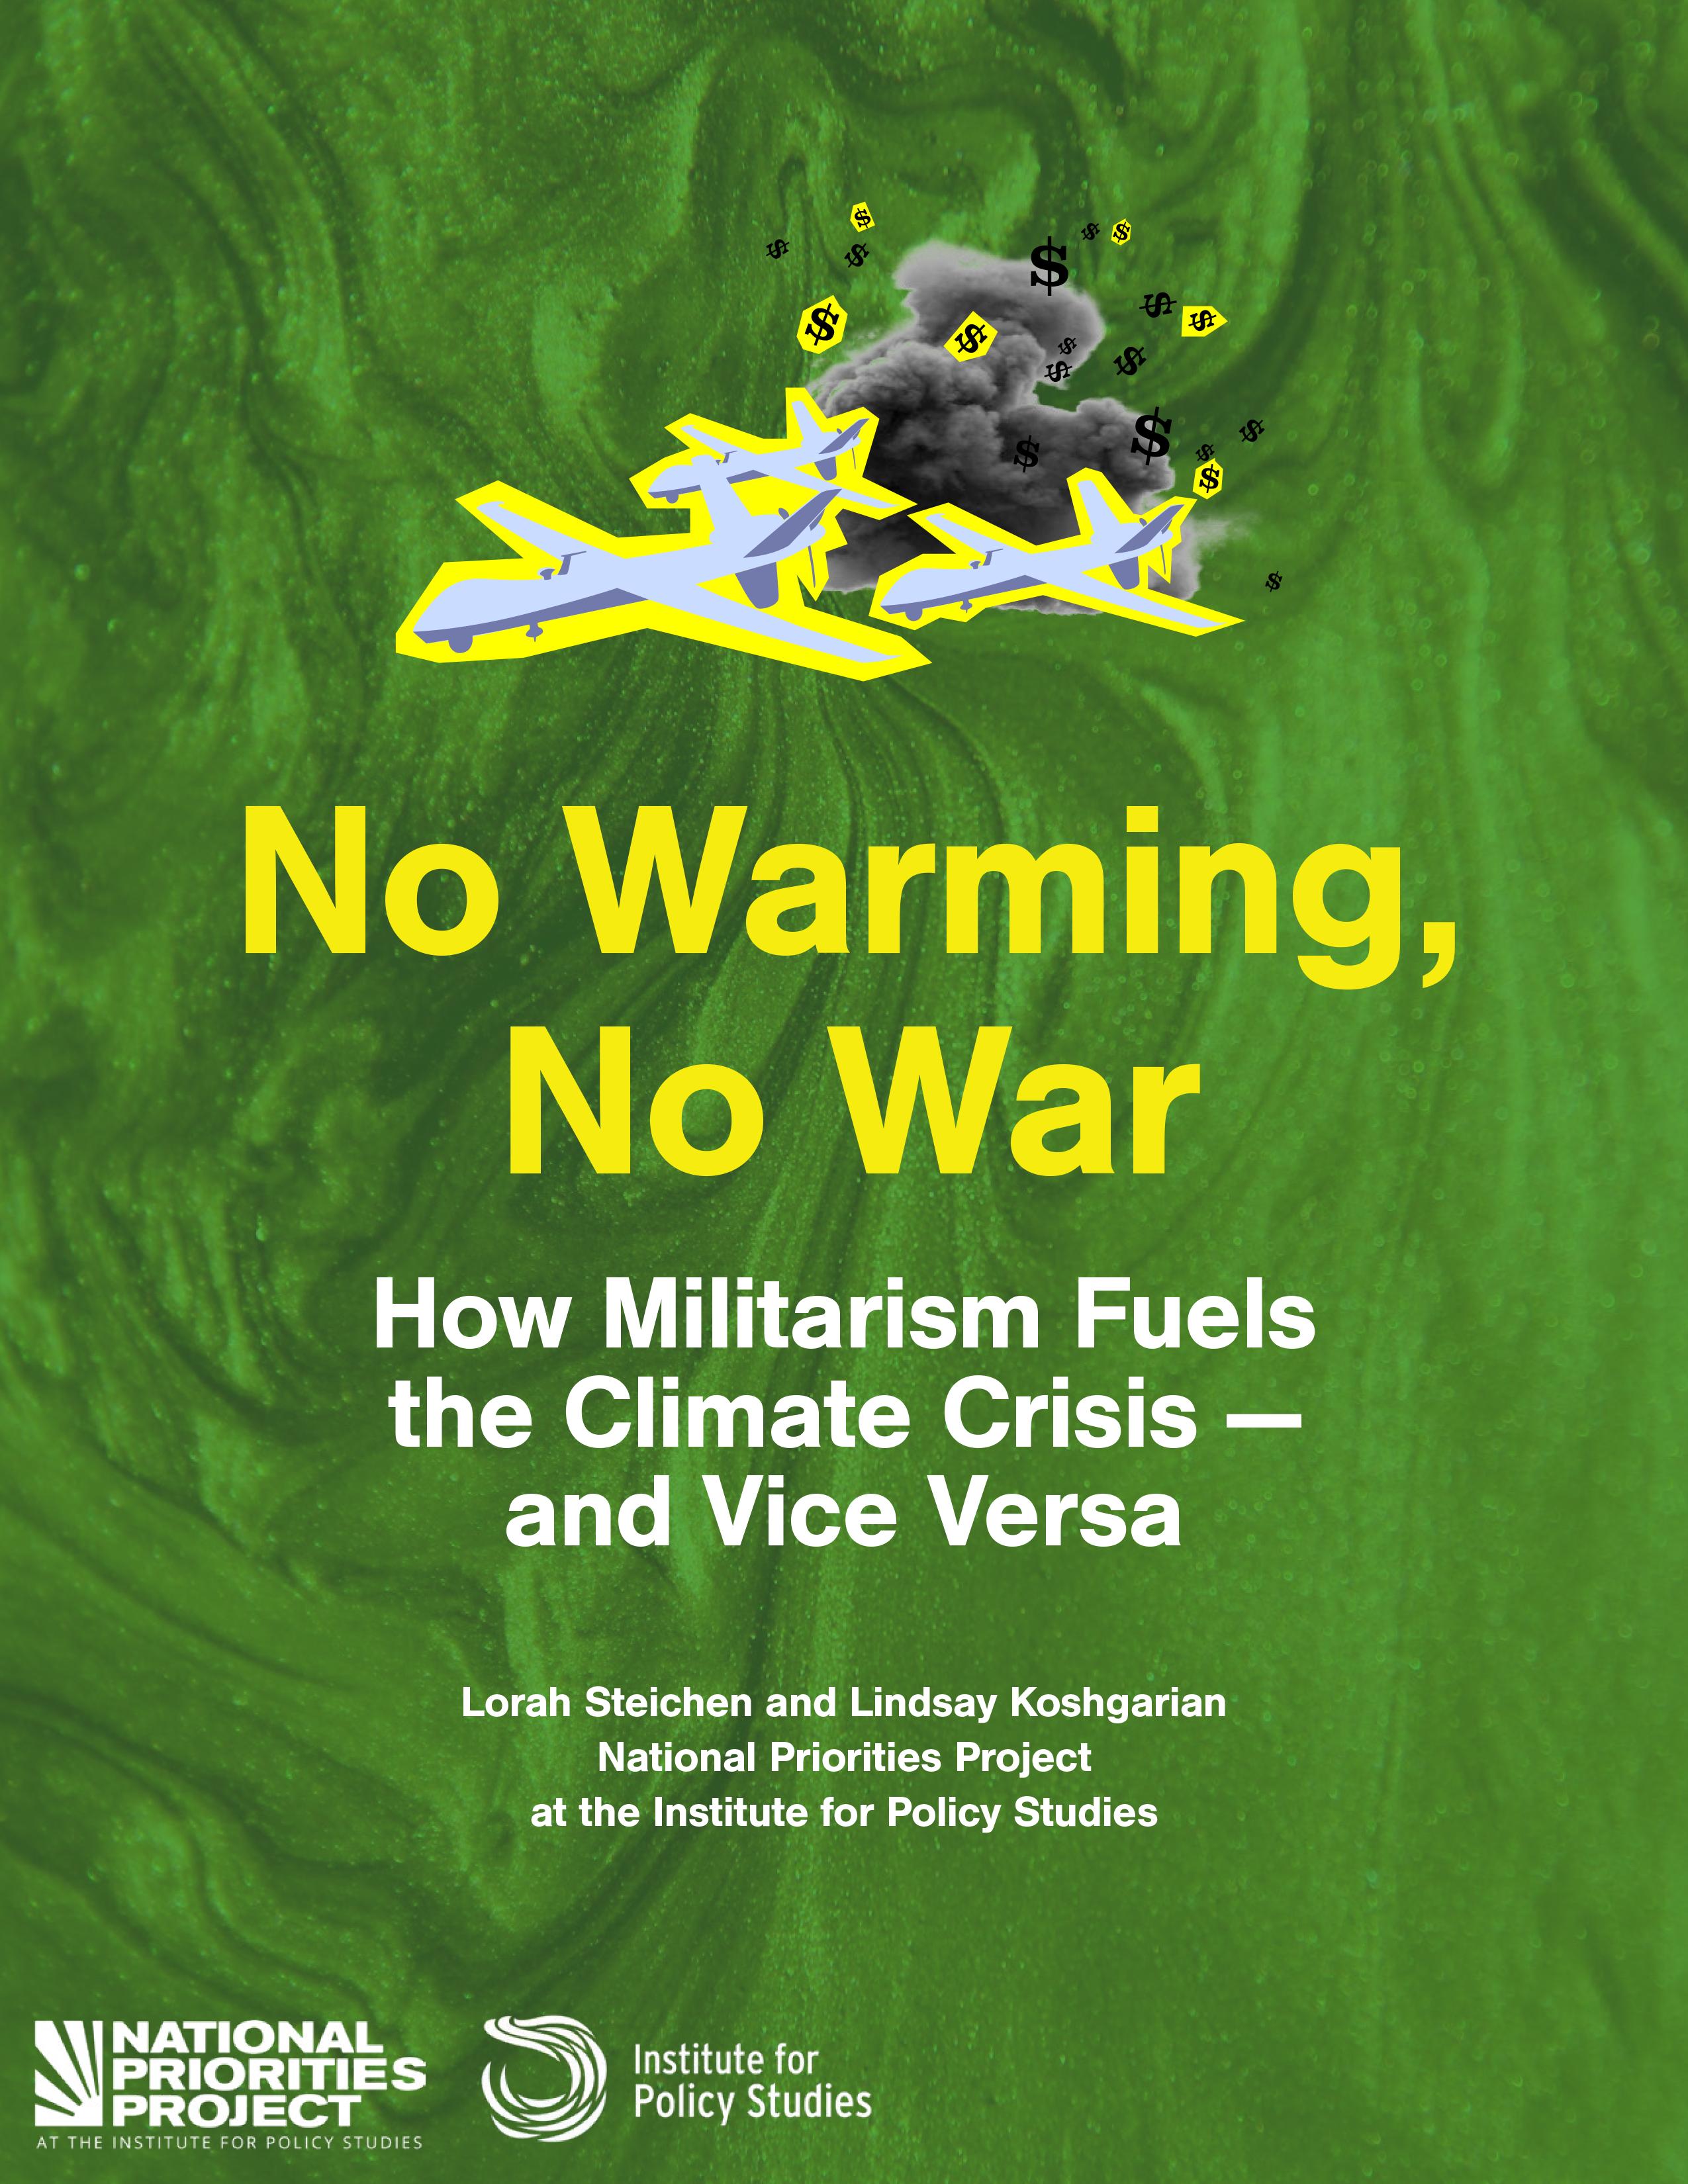 No Warming, No War: How Militarism Fuels the Climate Crisis—and Vice Versa